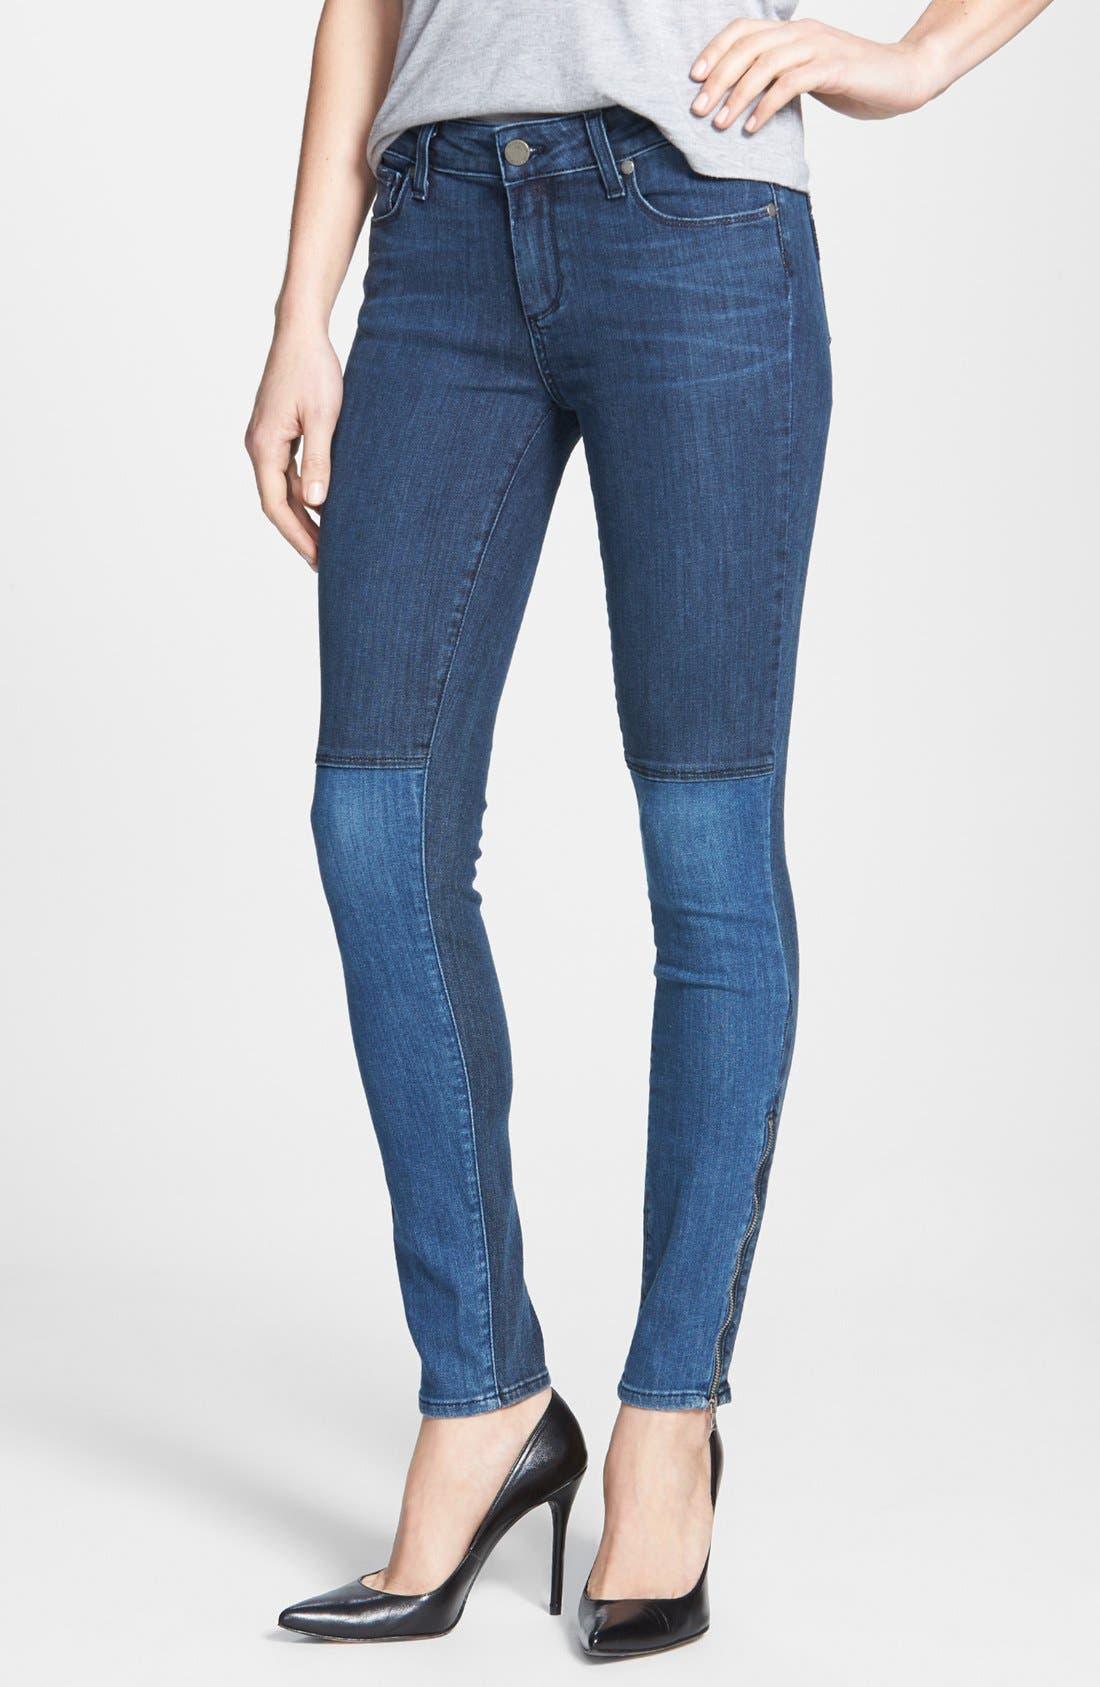 Alternate Image 1 Selected - Paige Denim 'Cara' Patchwork Ultra Skinny Jeans (Coastal)